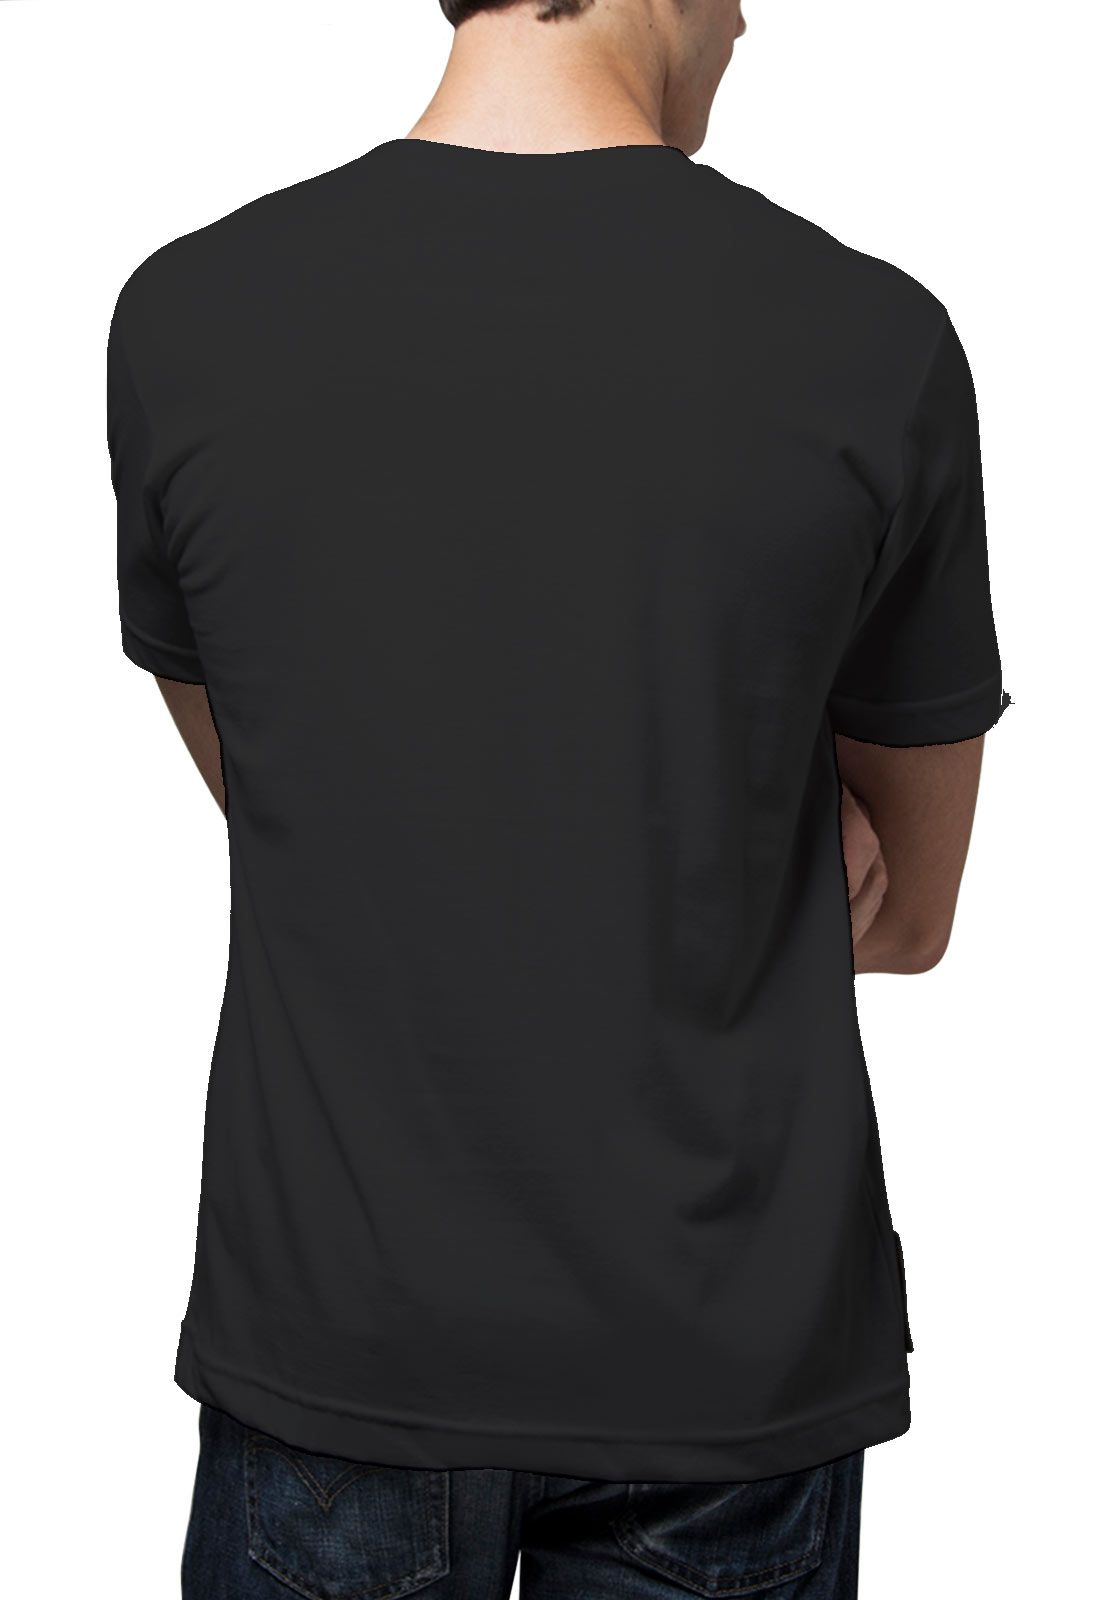 Camiseta Amazônia Palavras Natureza - Preto